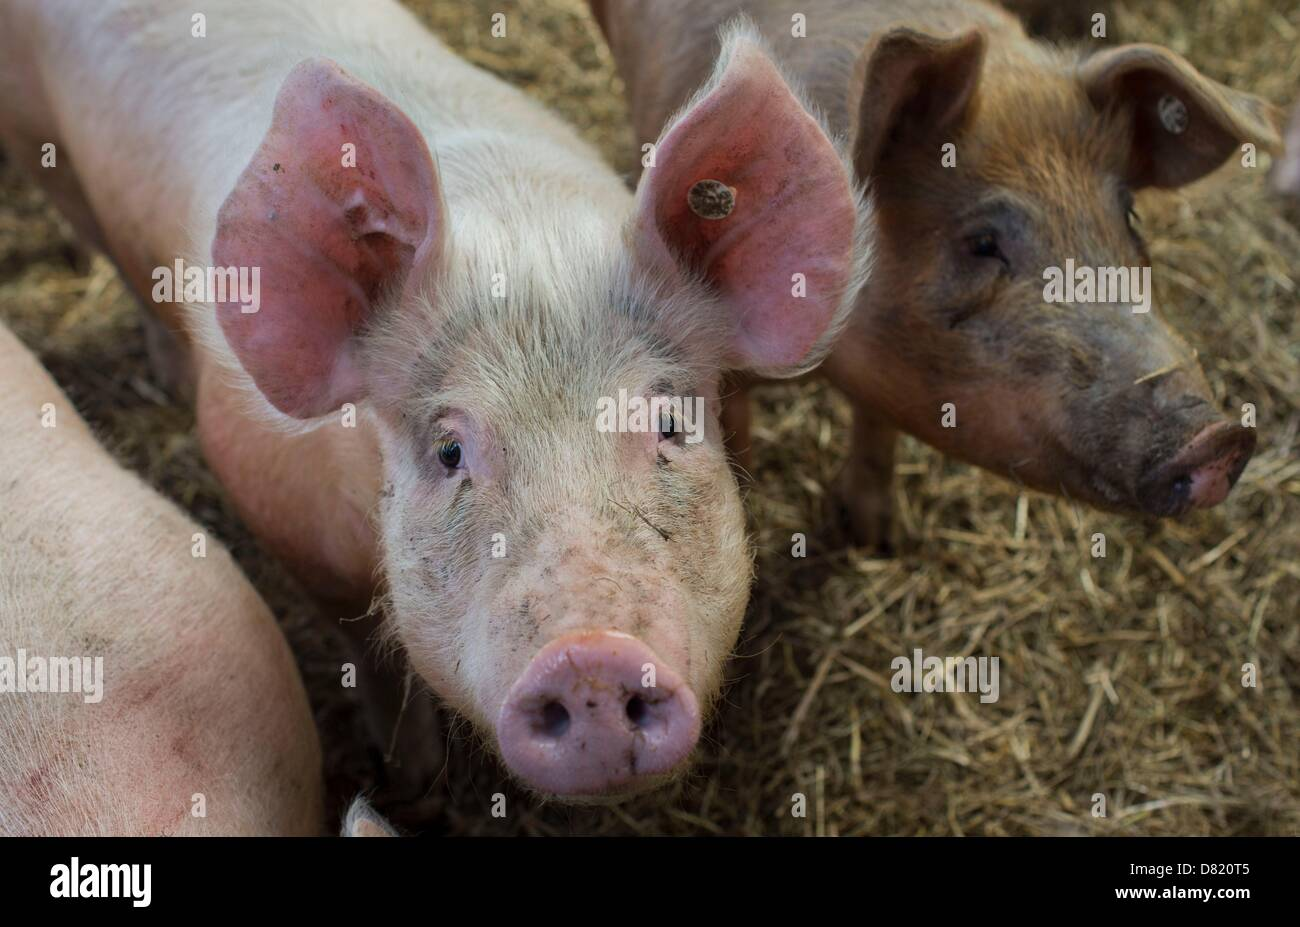 Swines are pictured in front of their stable at Gut Klepelshagen of the Deutschen Wildtierstiftung (German Foundation - Stock Image